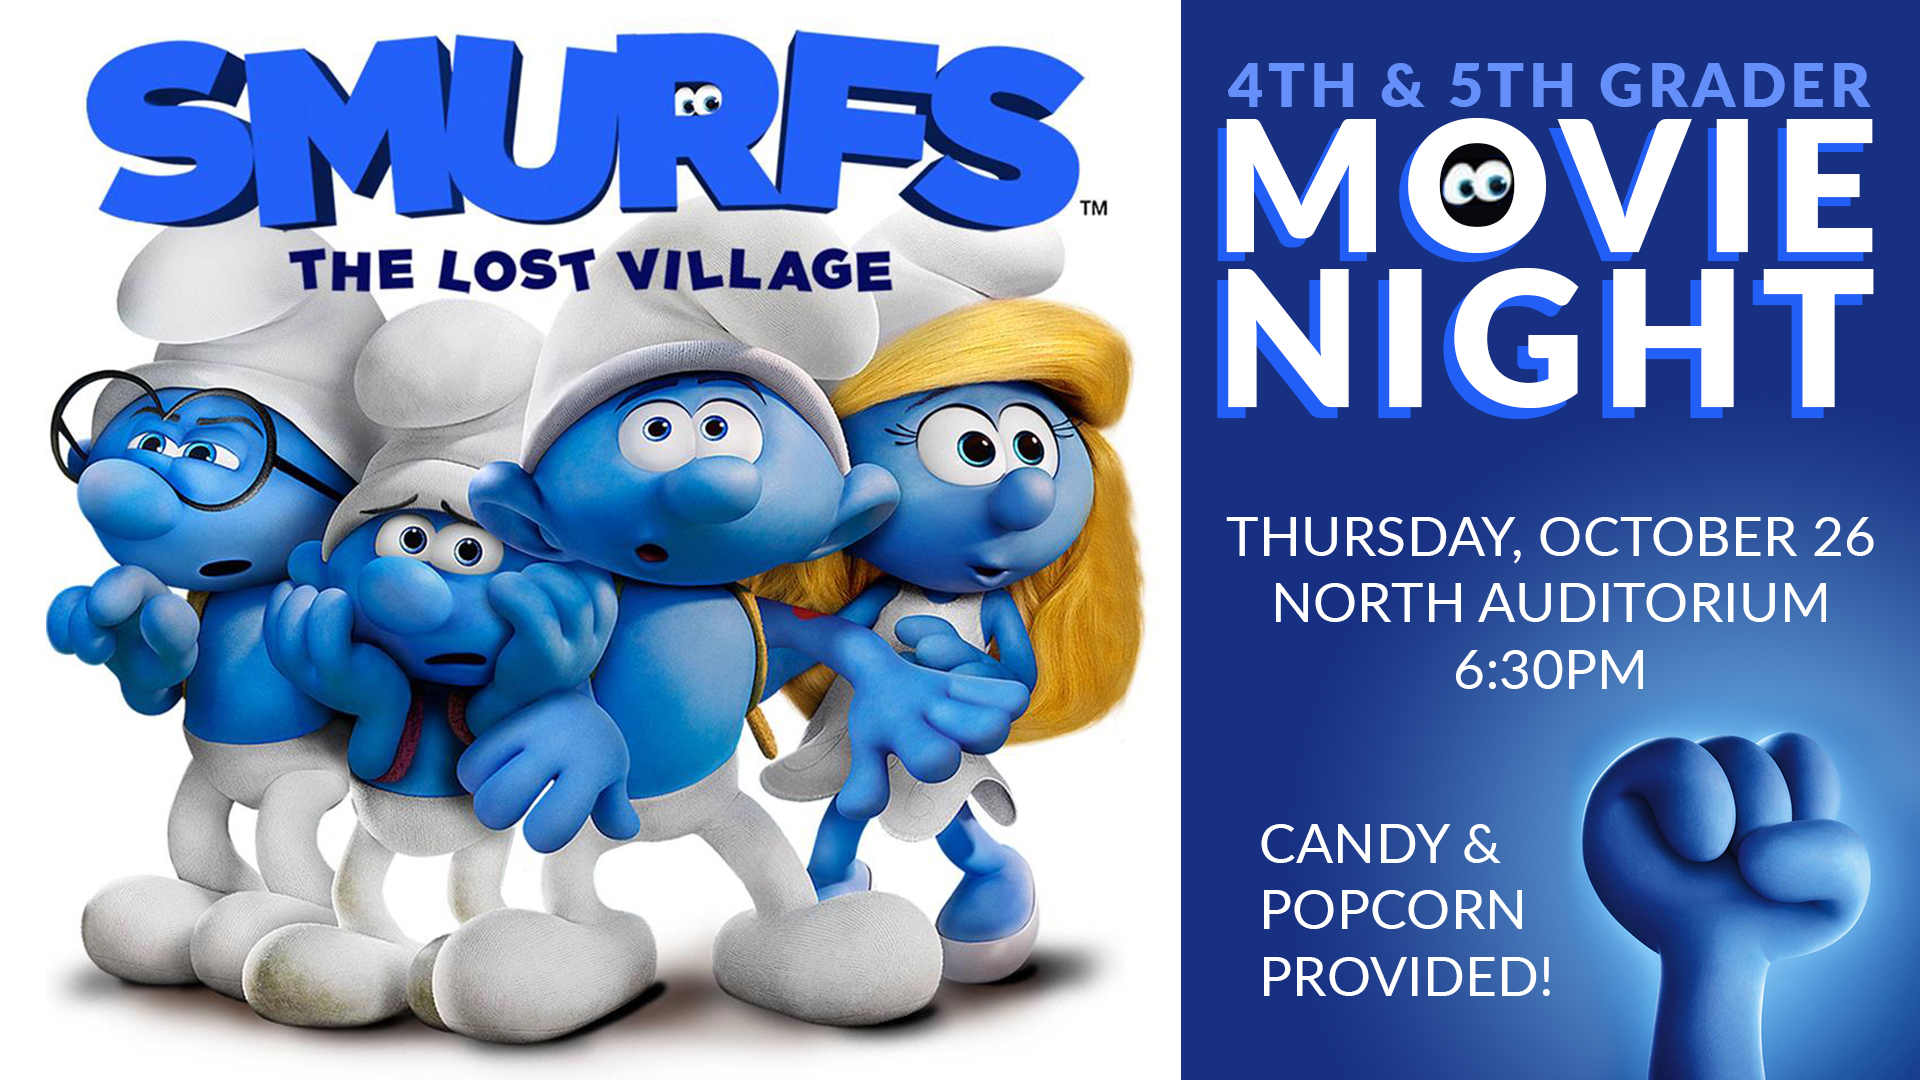 4th 5th Movie Night Announcement Slide.jpg